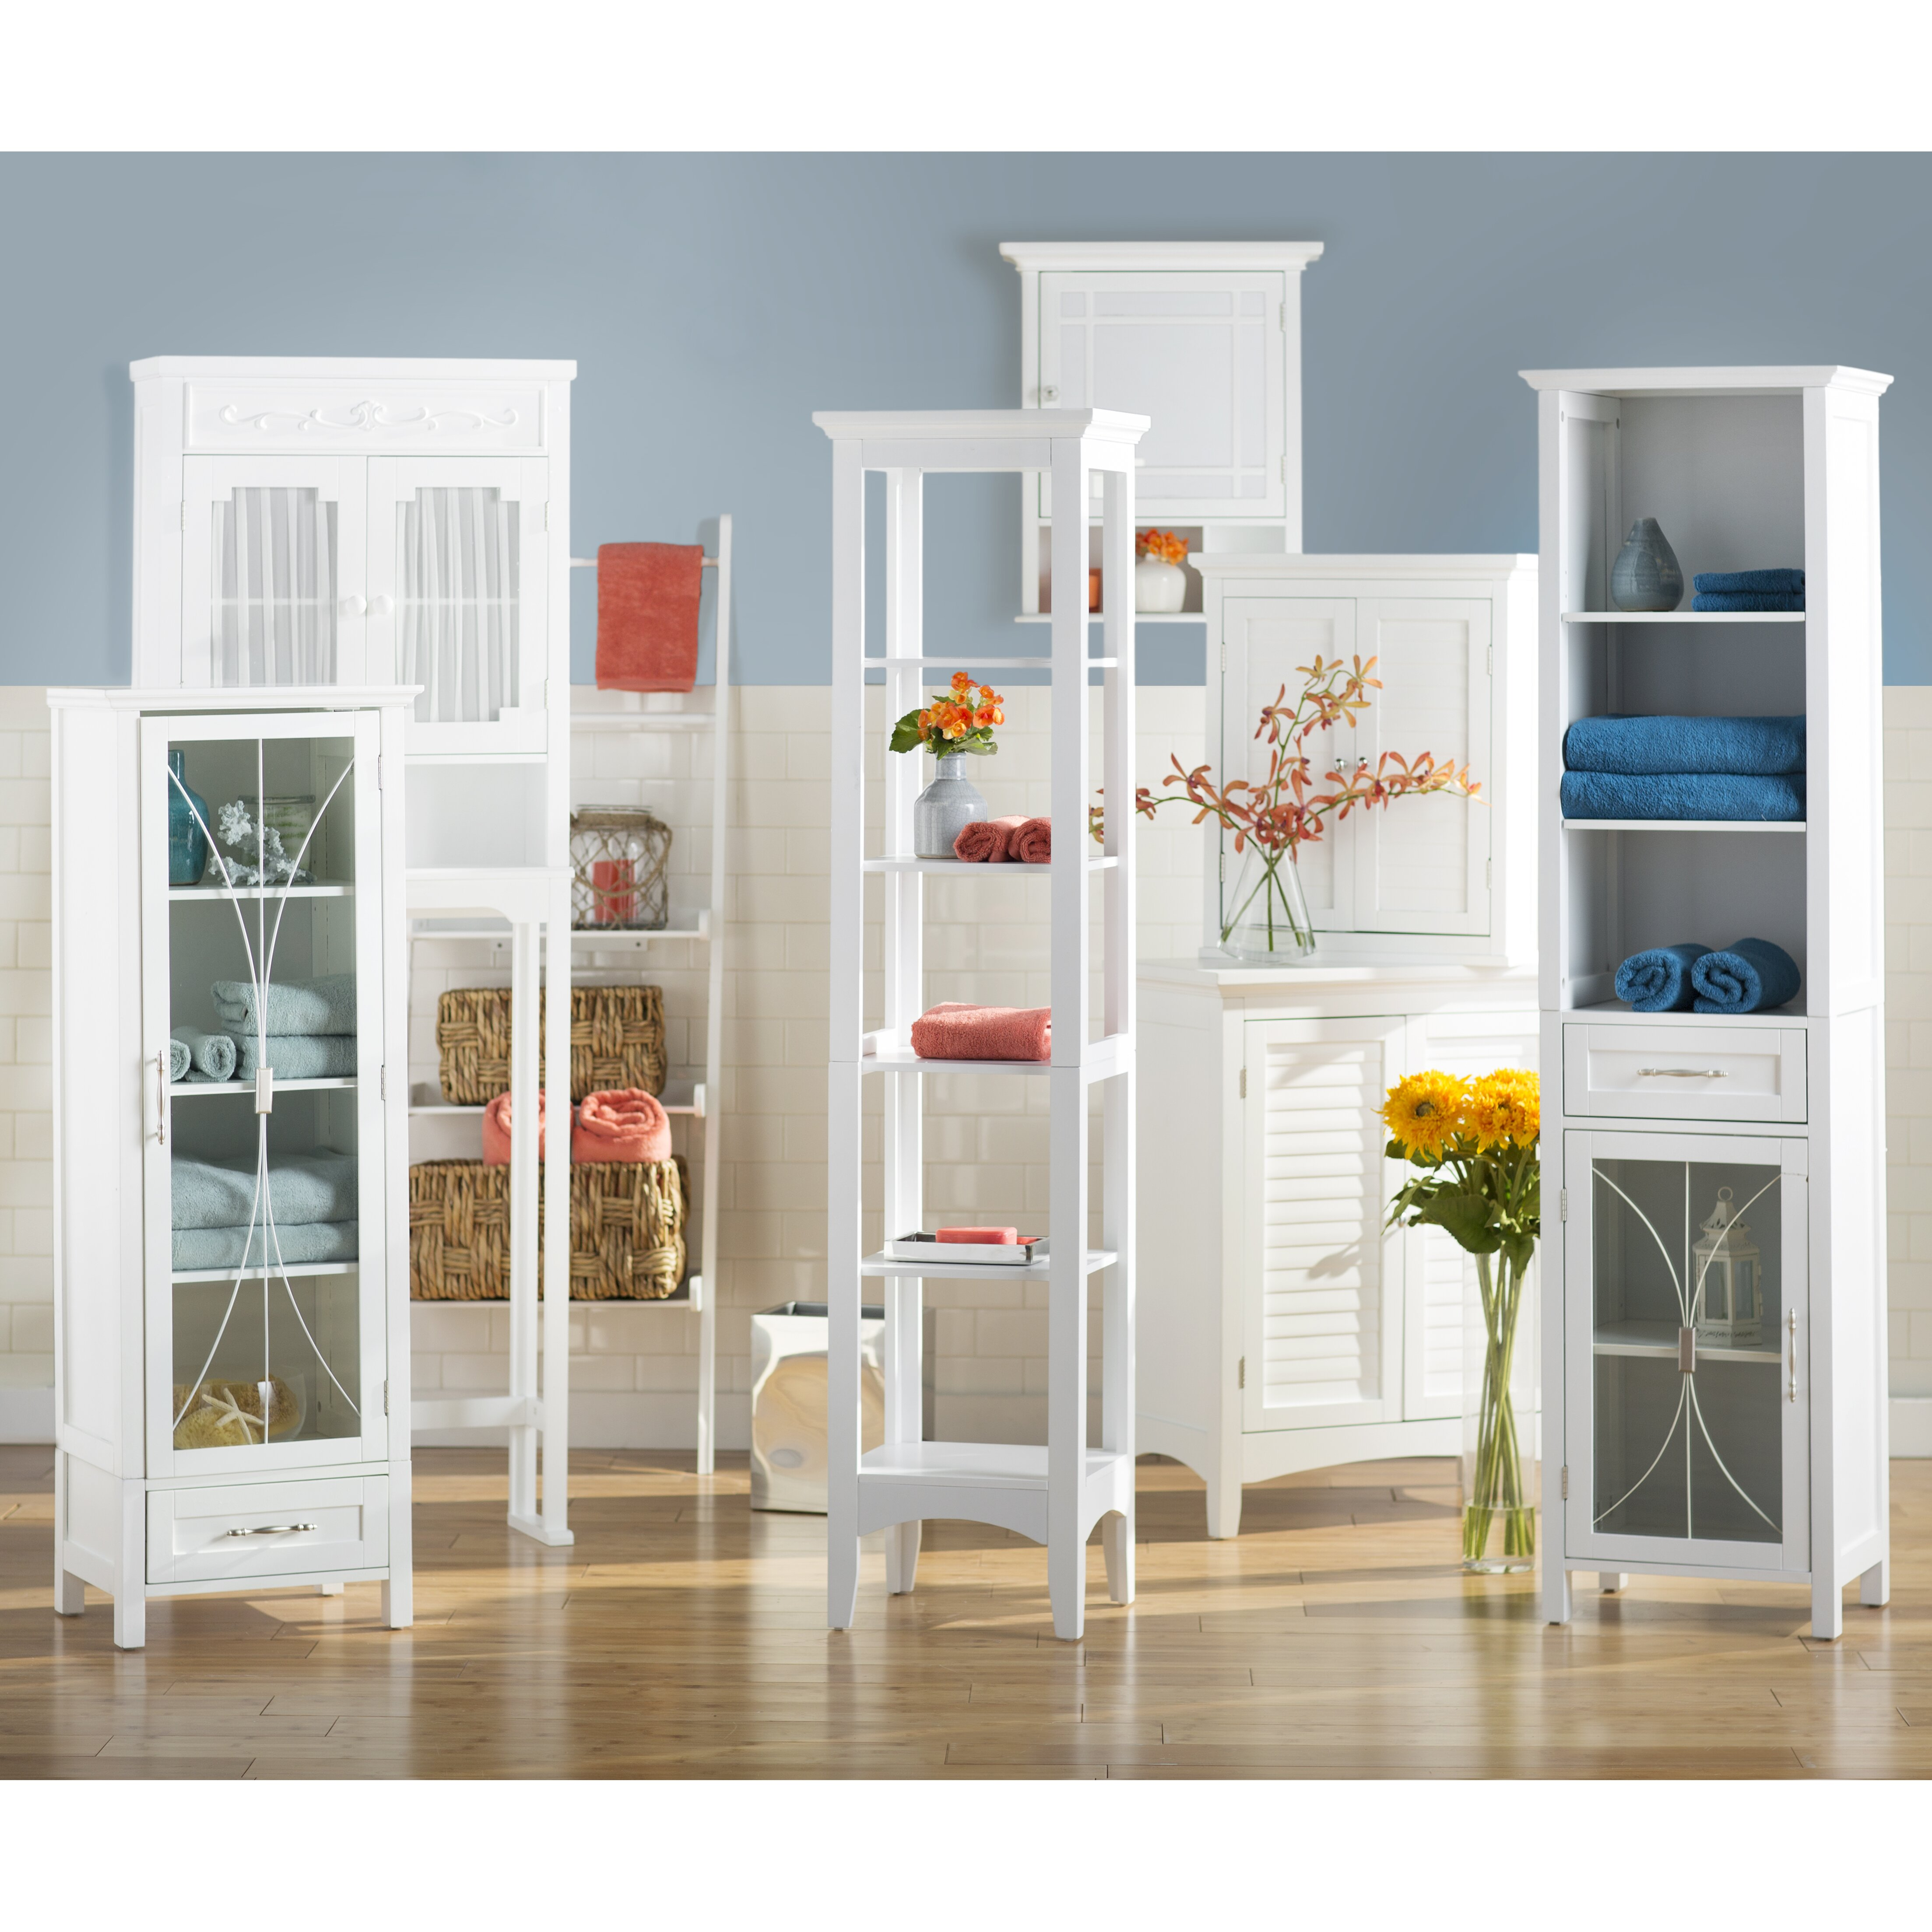 24 X 36 Medicine Cabinet Charlton Home Elba 20 X 2413 Surface Mount Medicine Cabinet